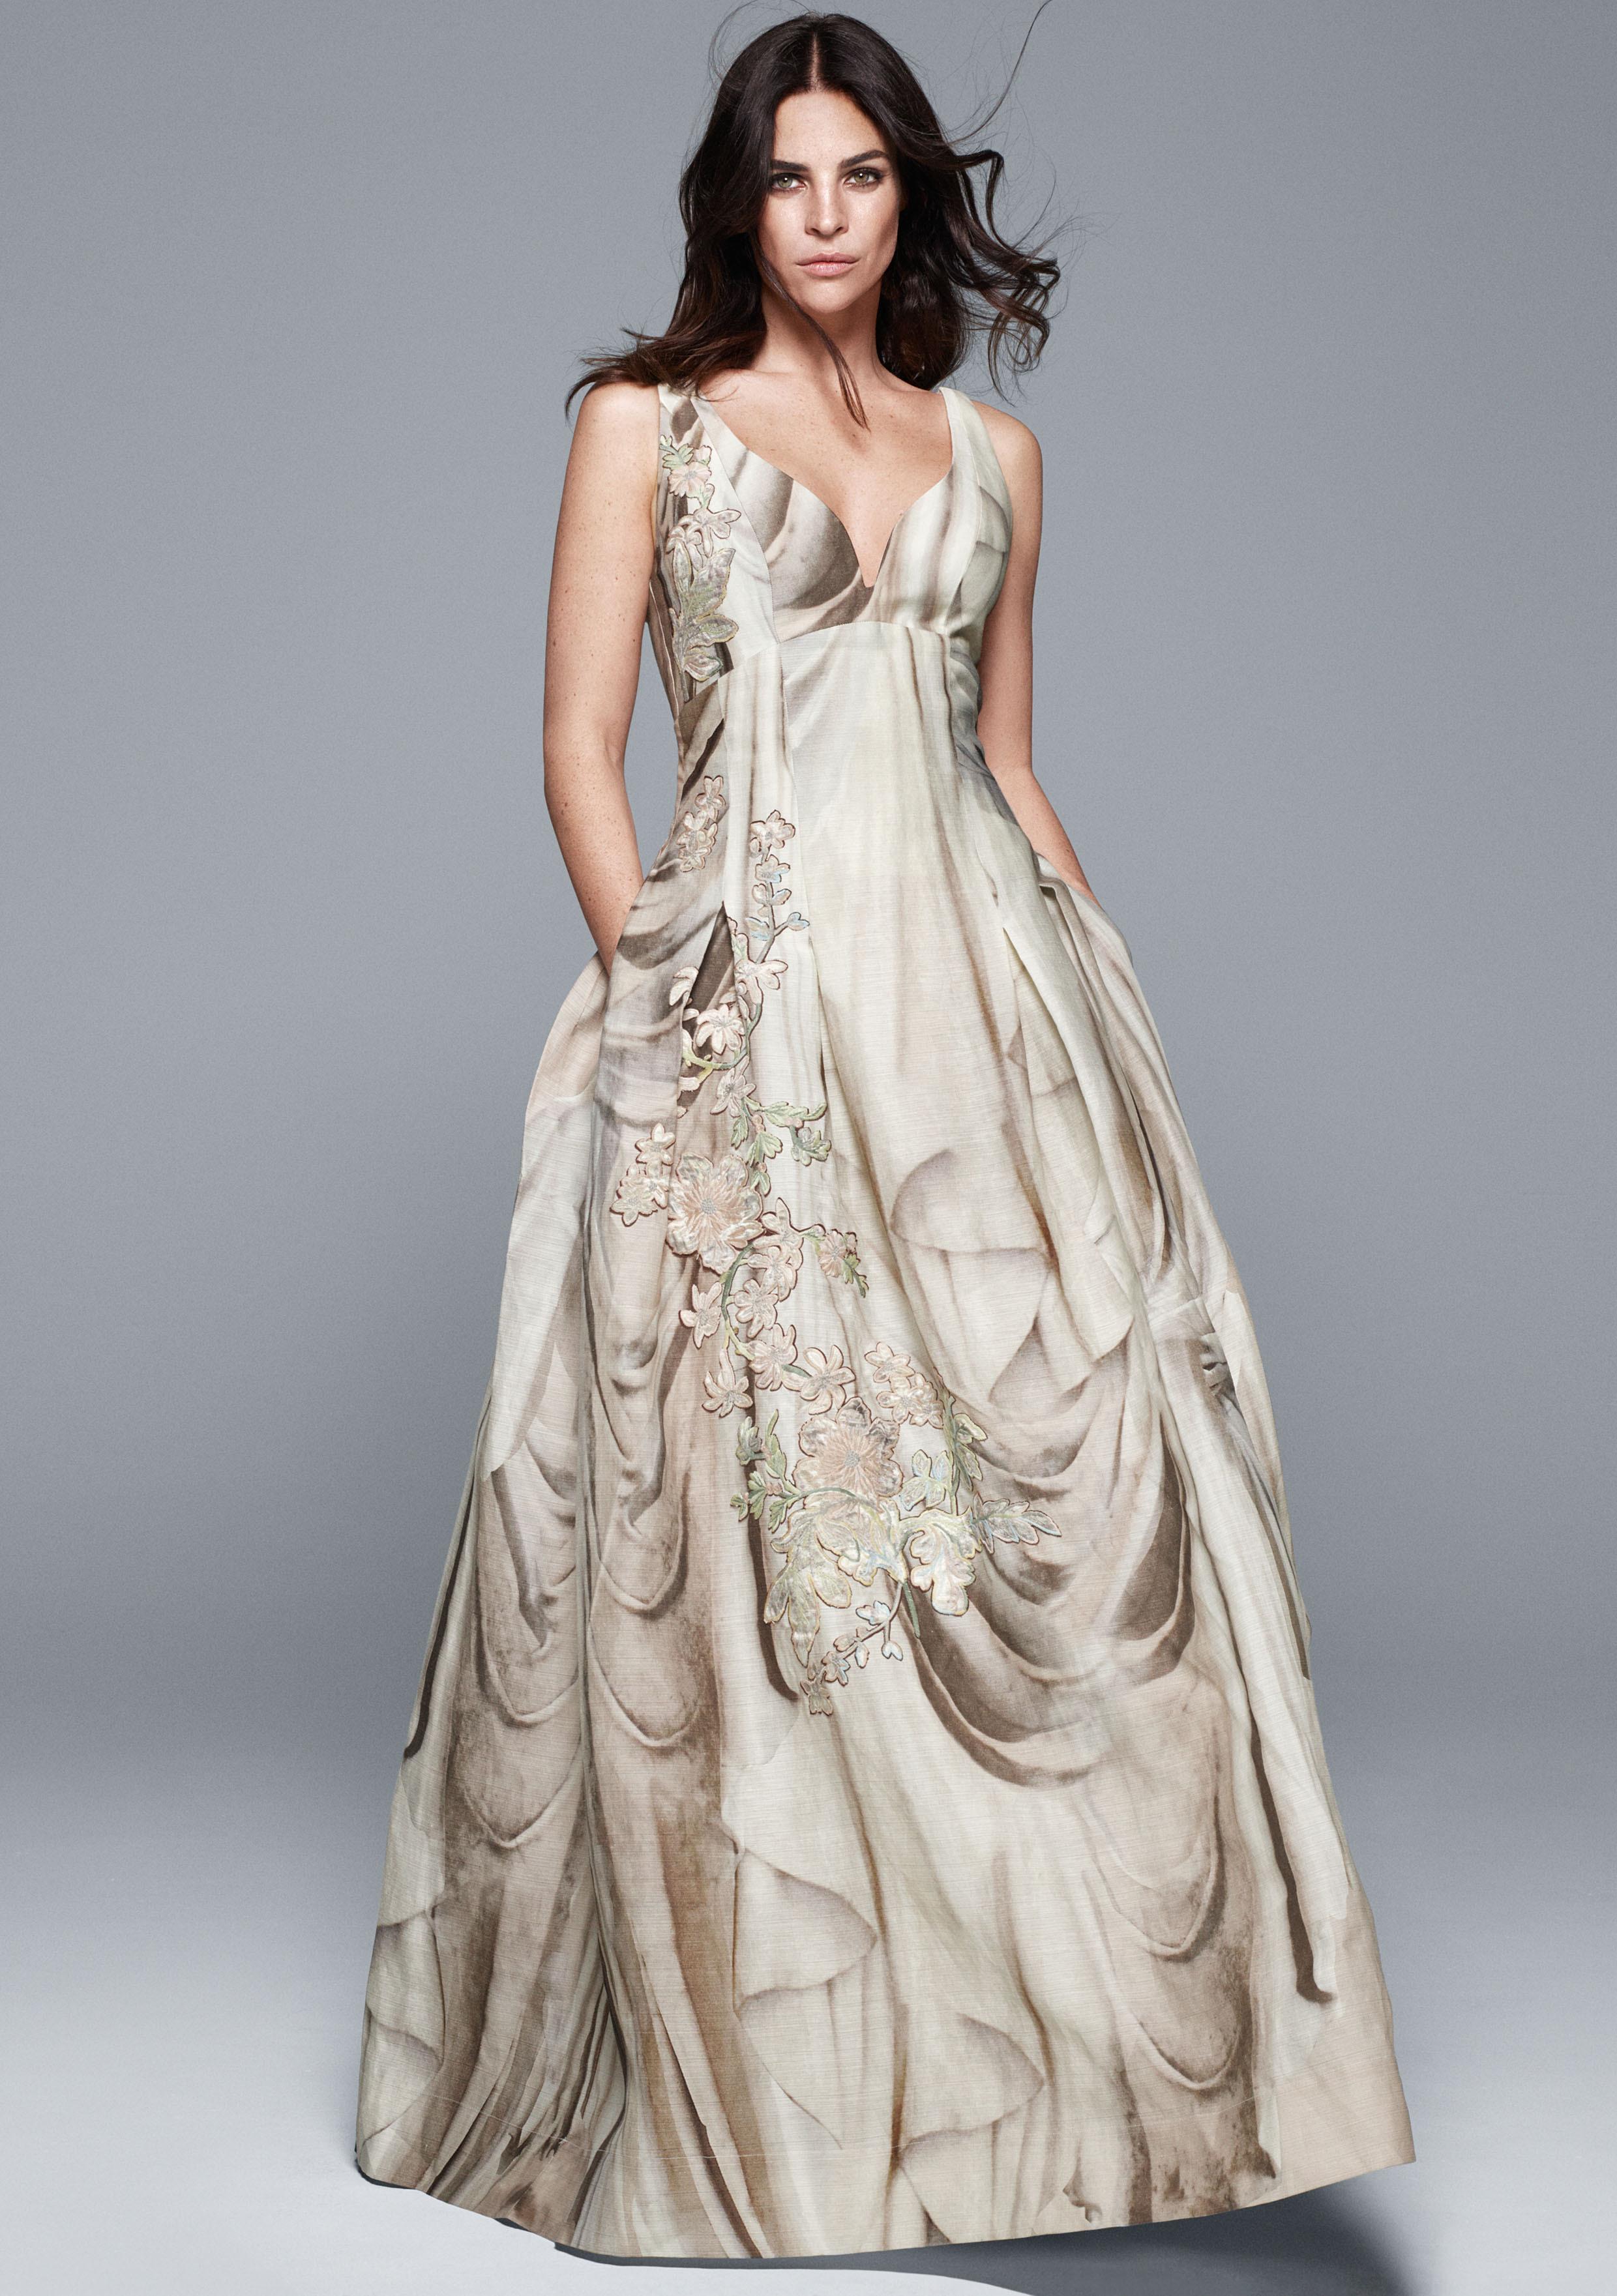 H m prom dresses uk daylight